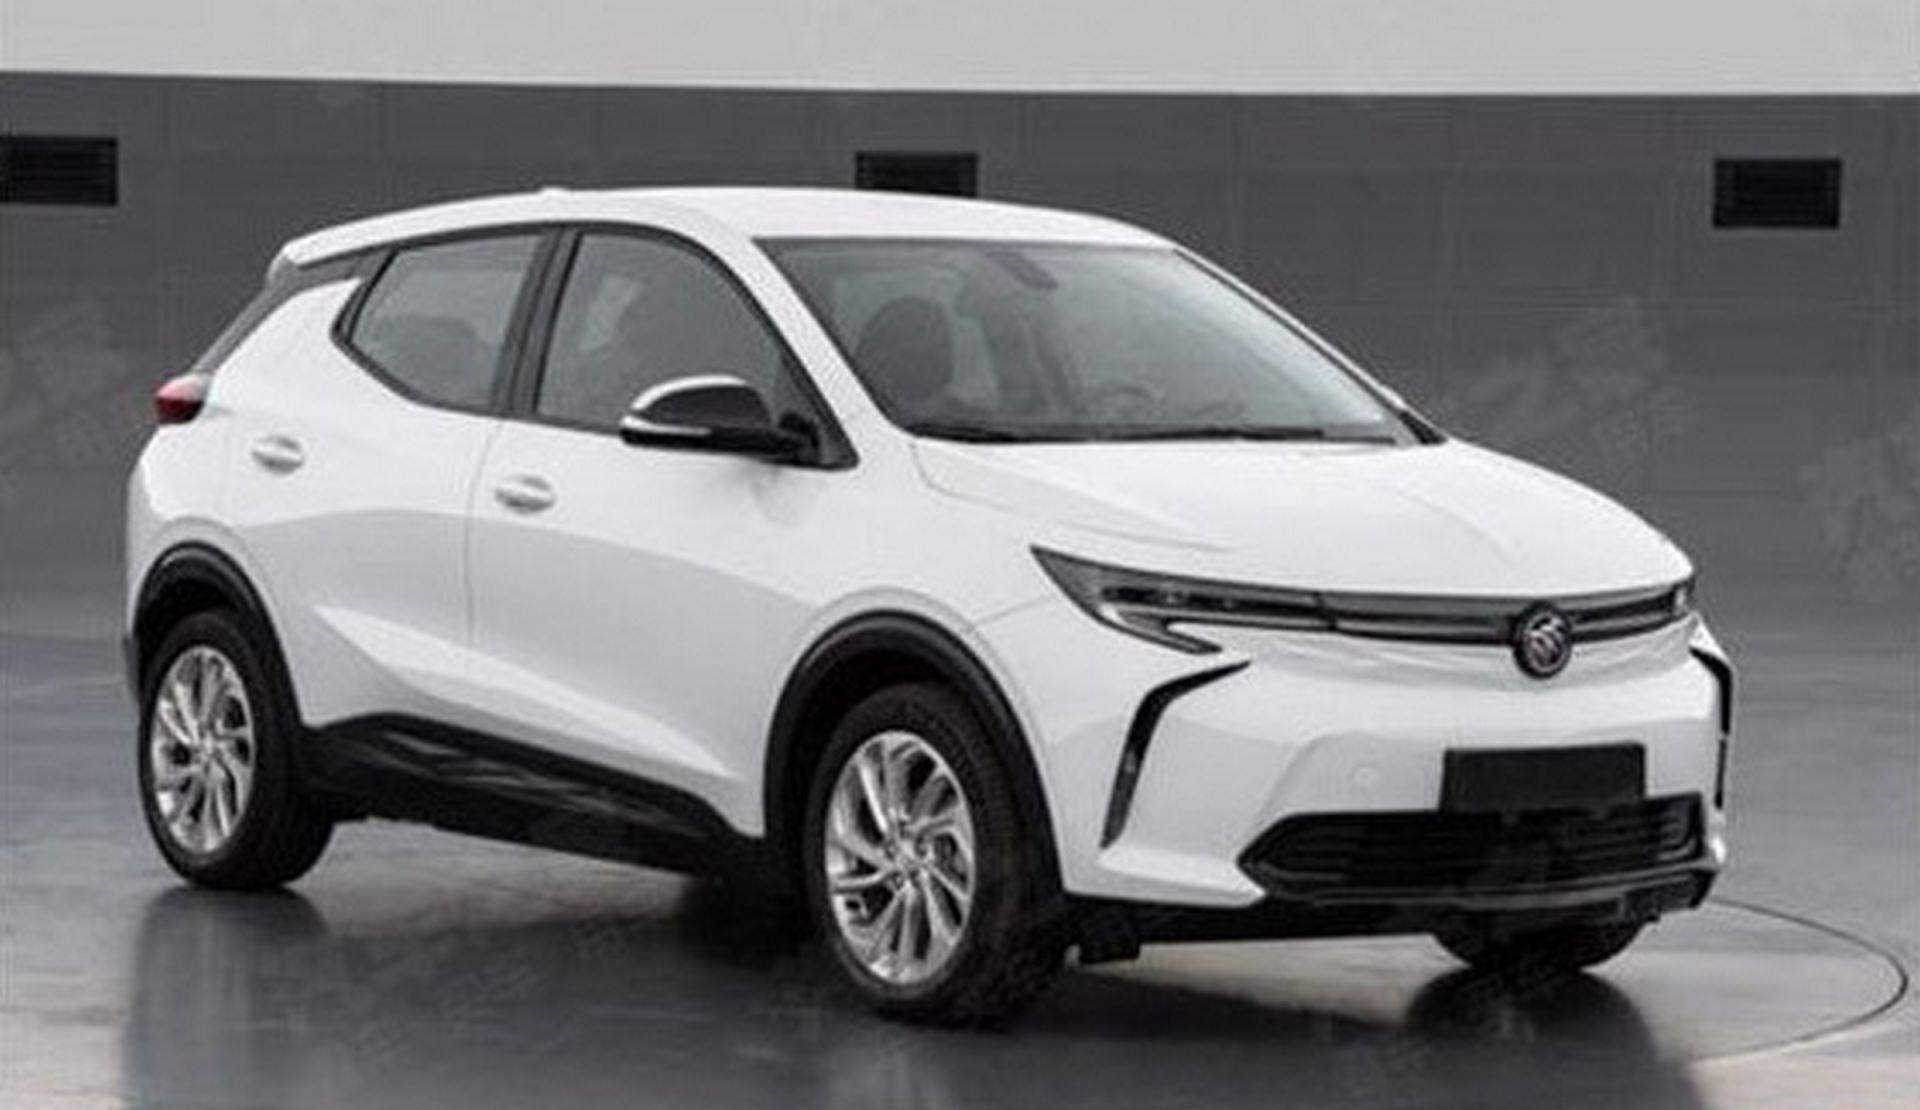 Chevyrolet-Bolt-crossover-2021-Buick-Velite-7-3-3